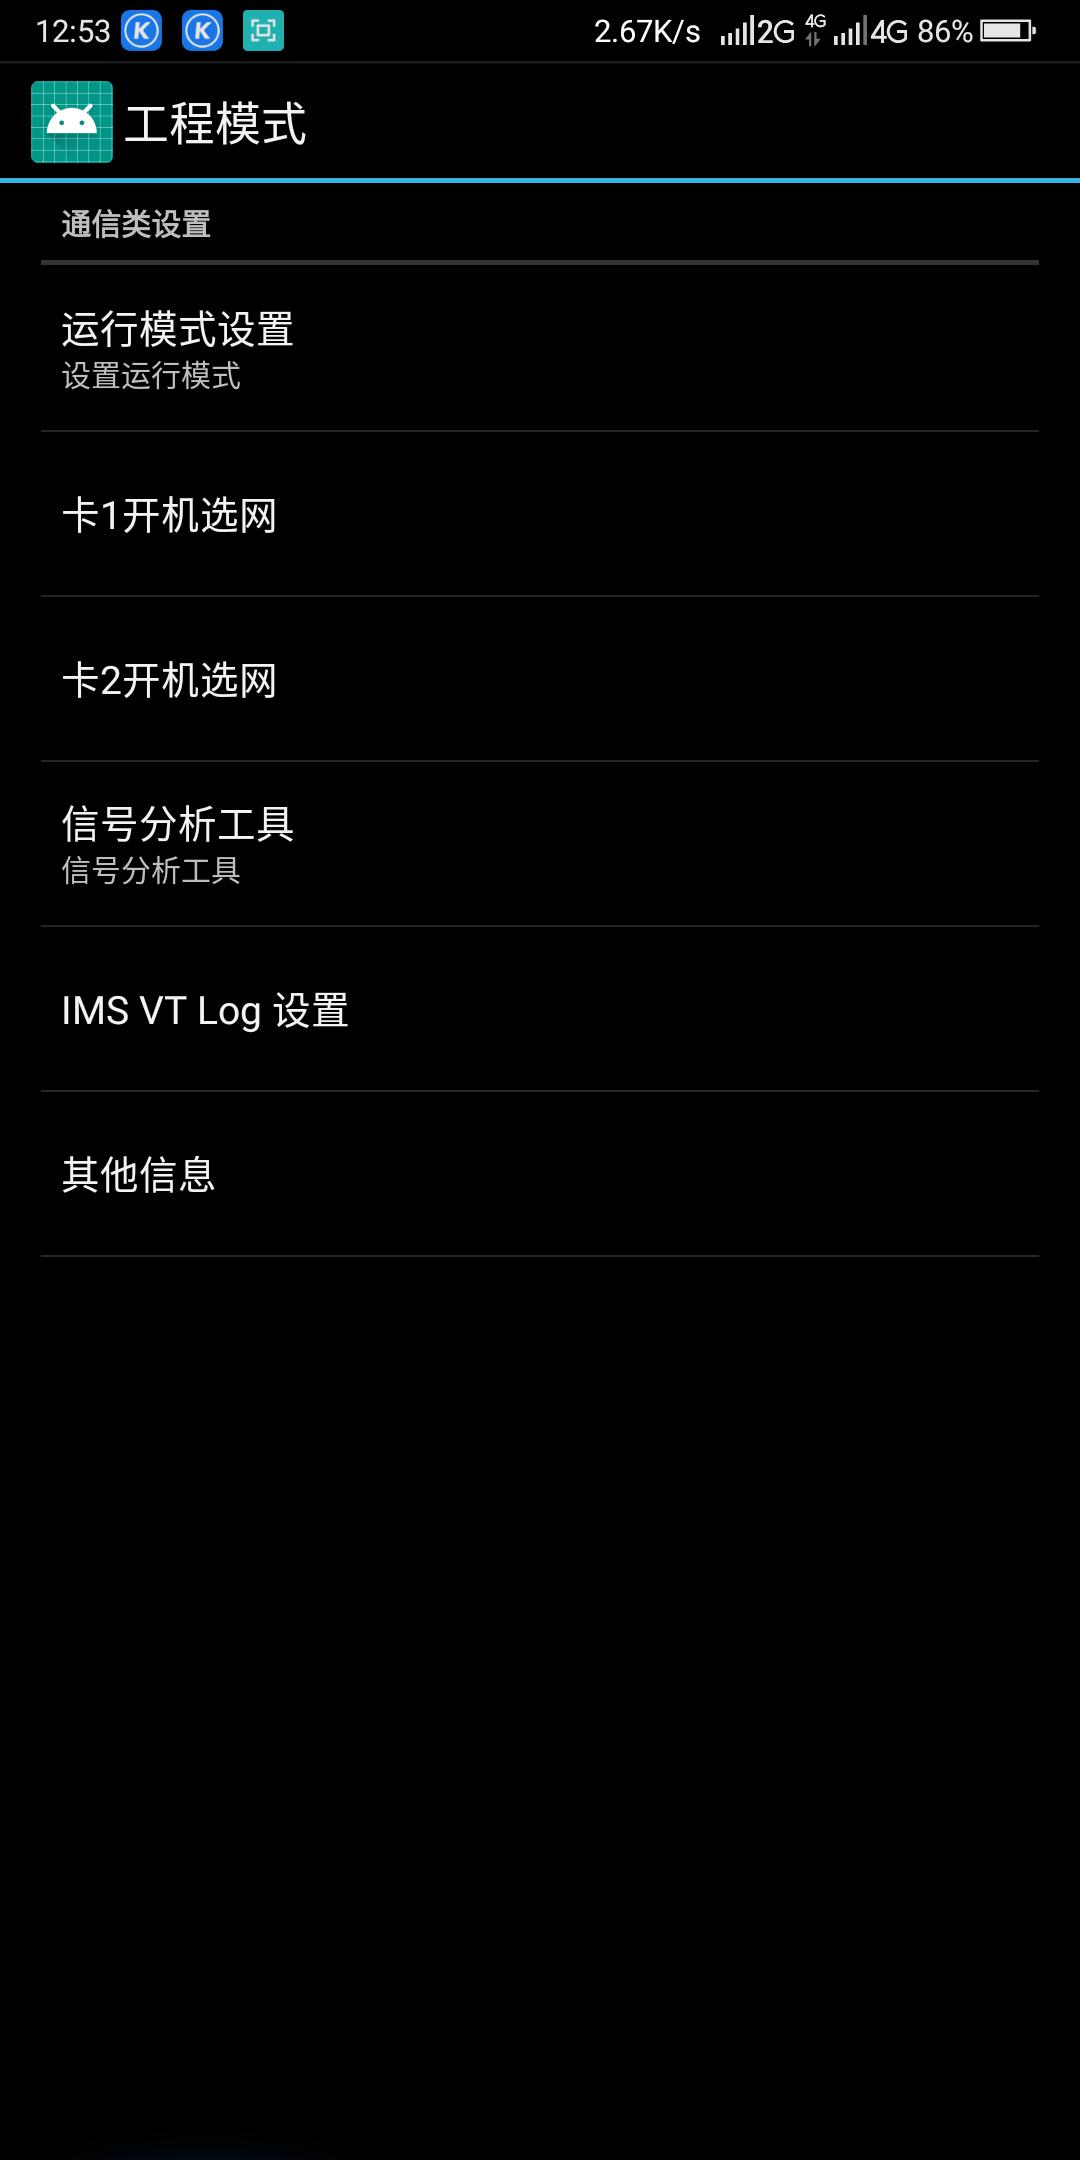 Screenshot_2018-06-19-12-53-01.png